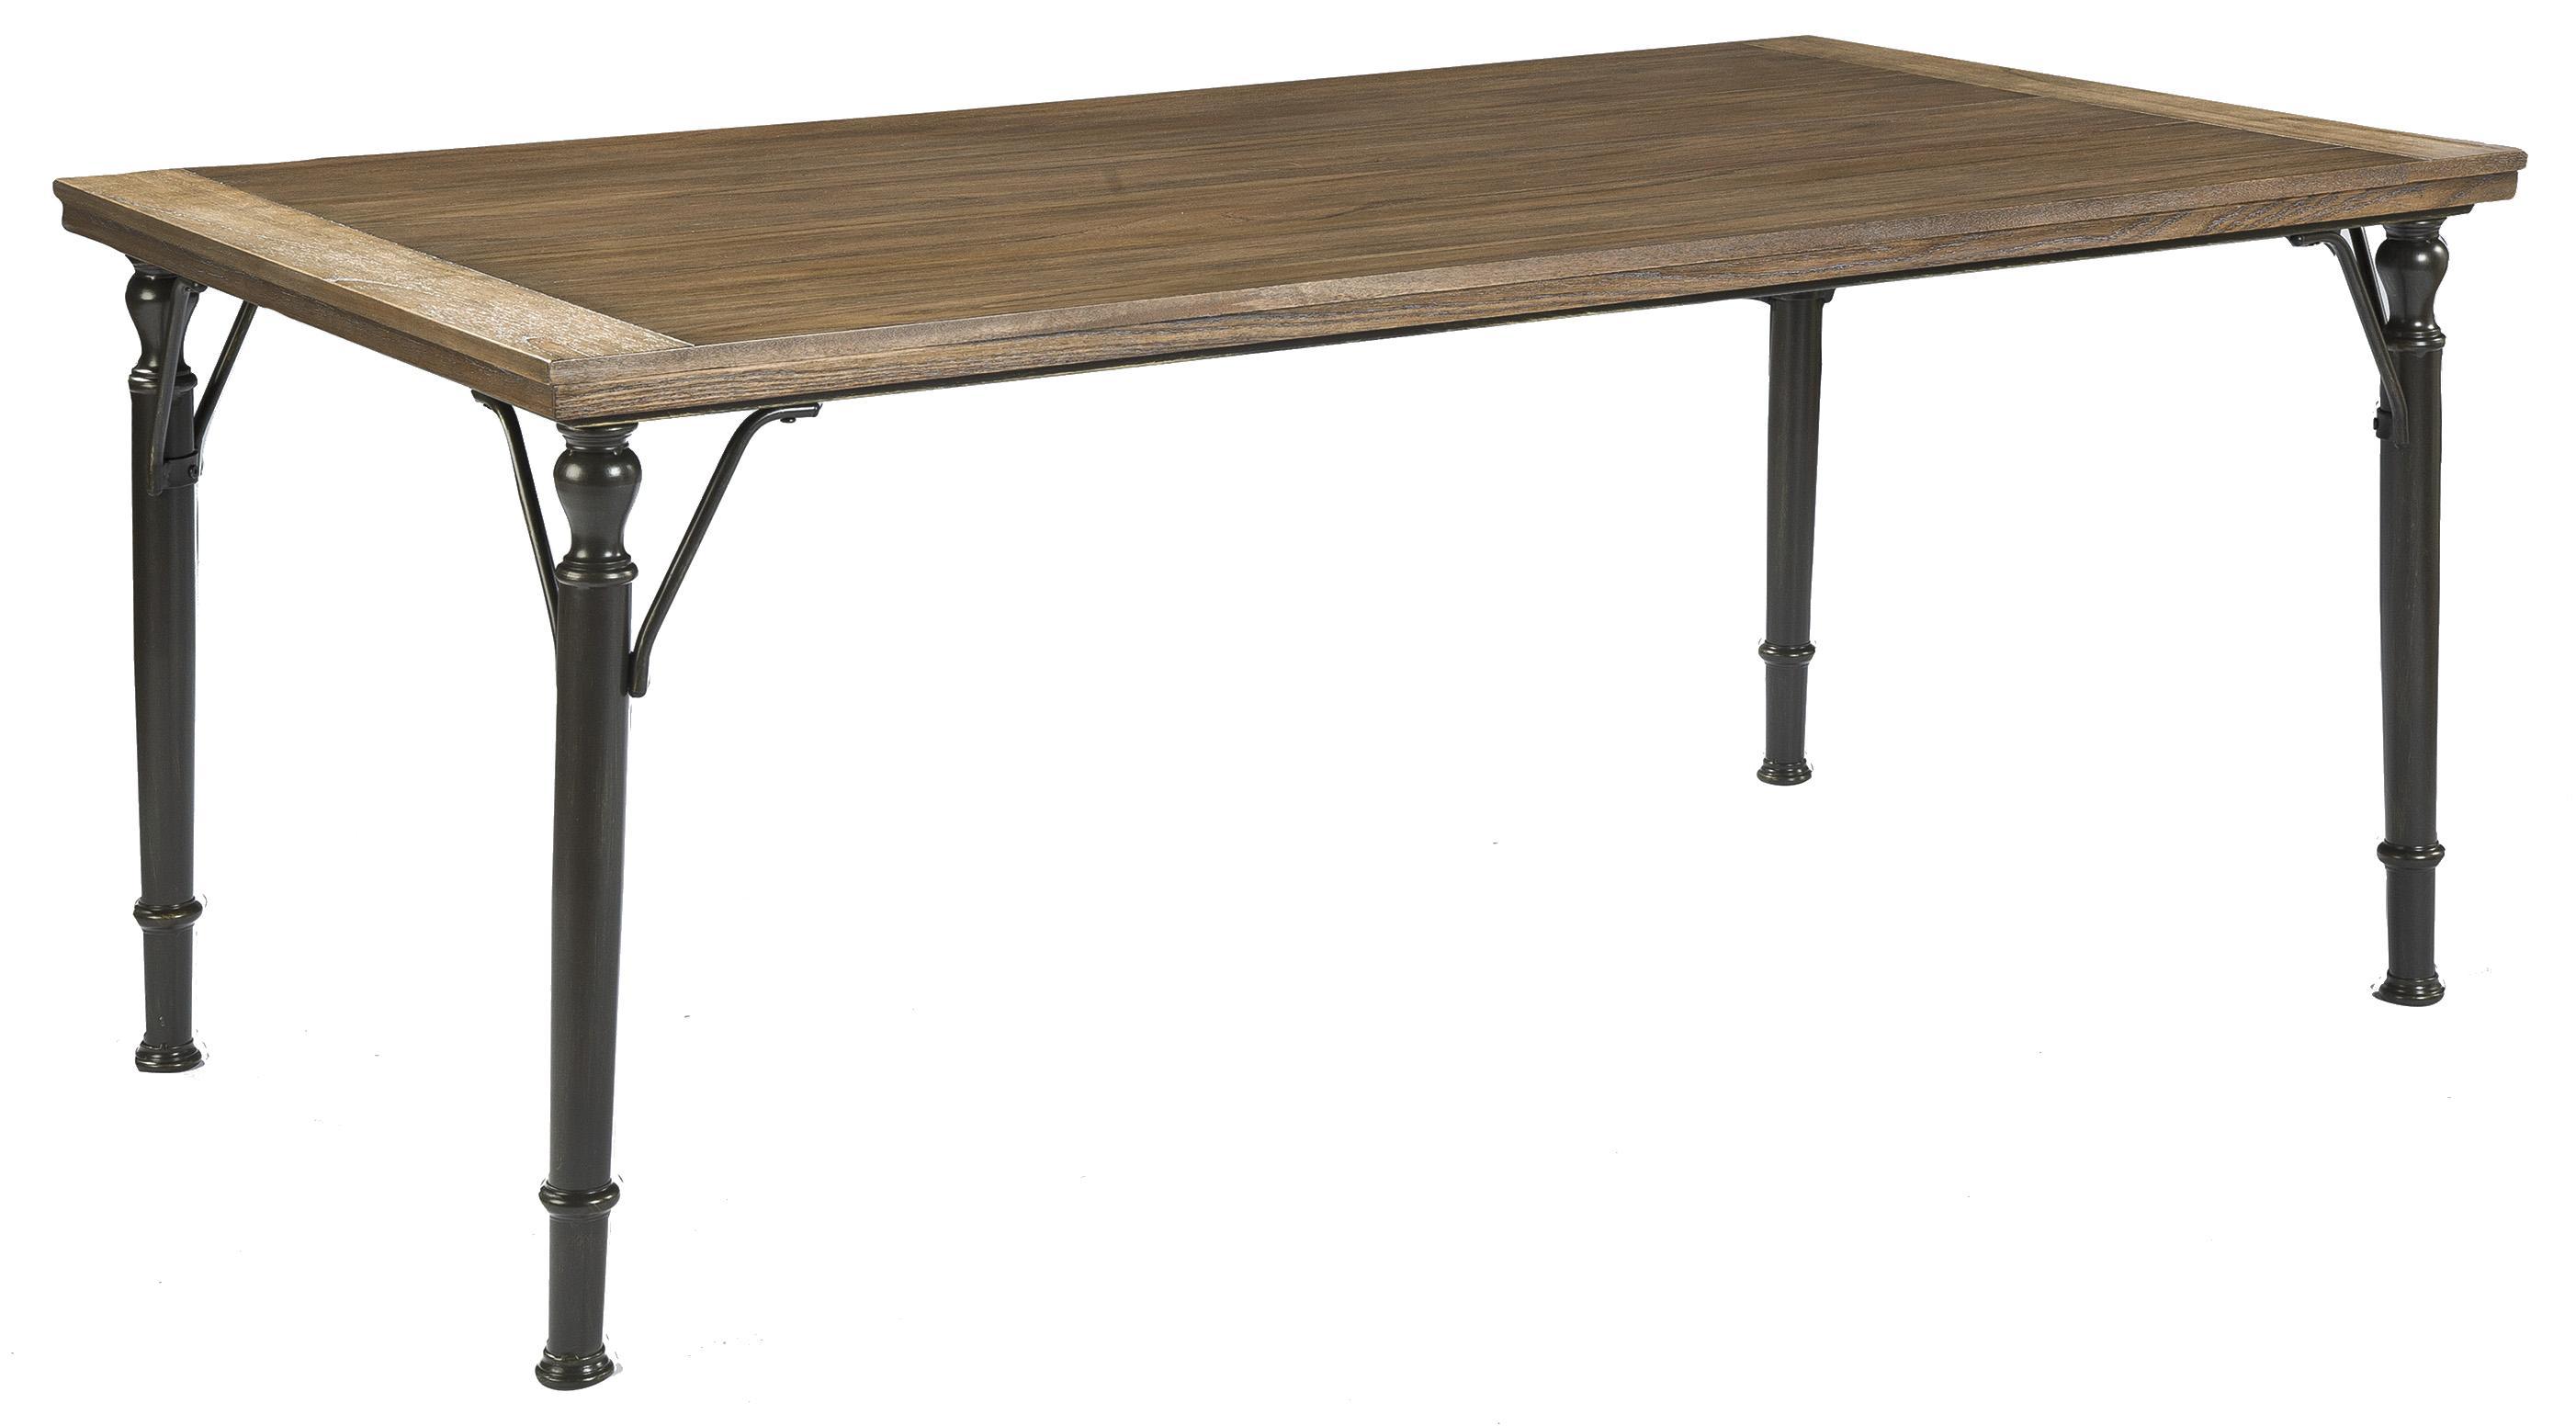 signature design by ashley tripton 5 piece rectangular dining room table set w wood top metal. Black Bedroom Furniture Sets. Home Design Ideas